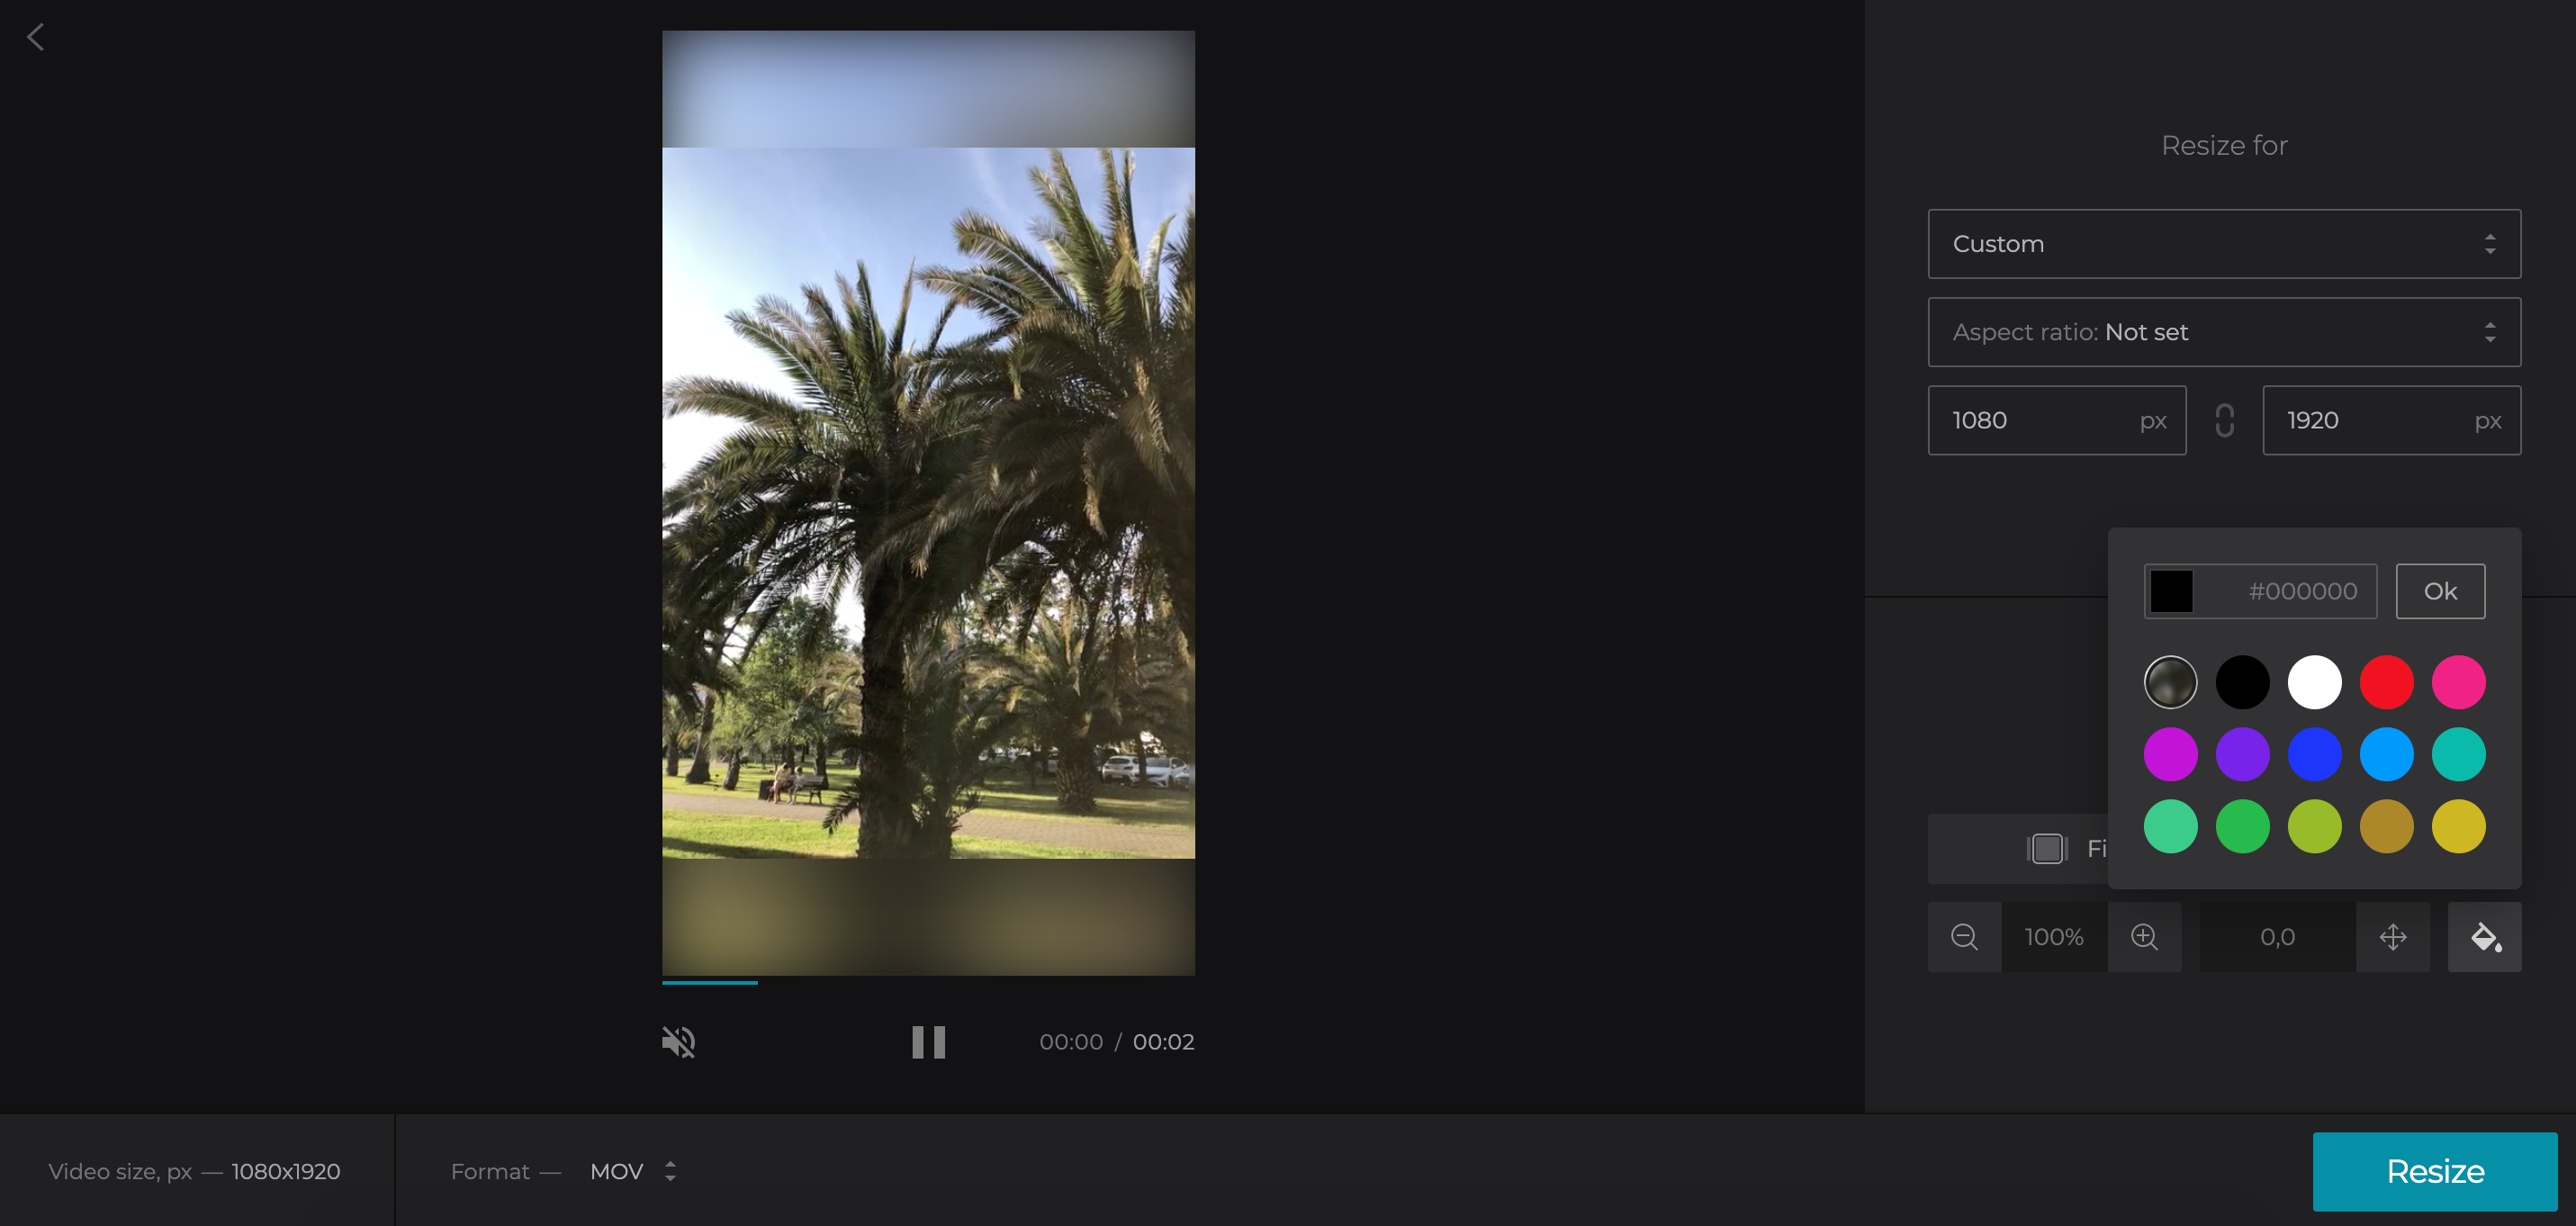 Change size of TikTok video